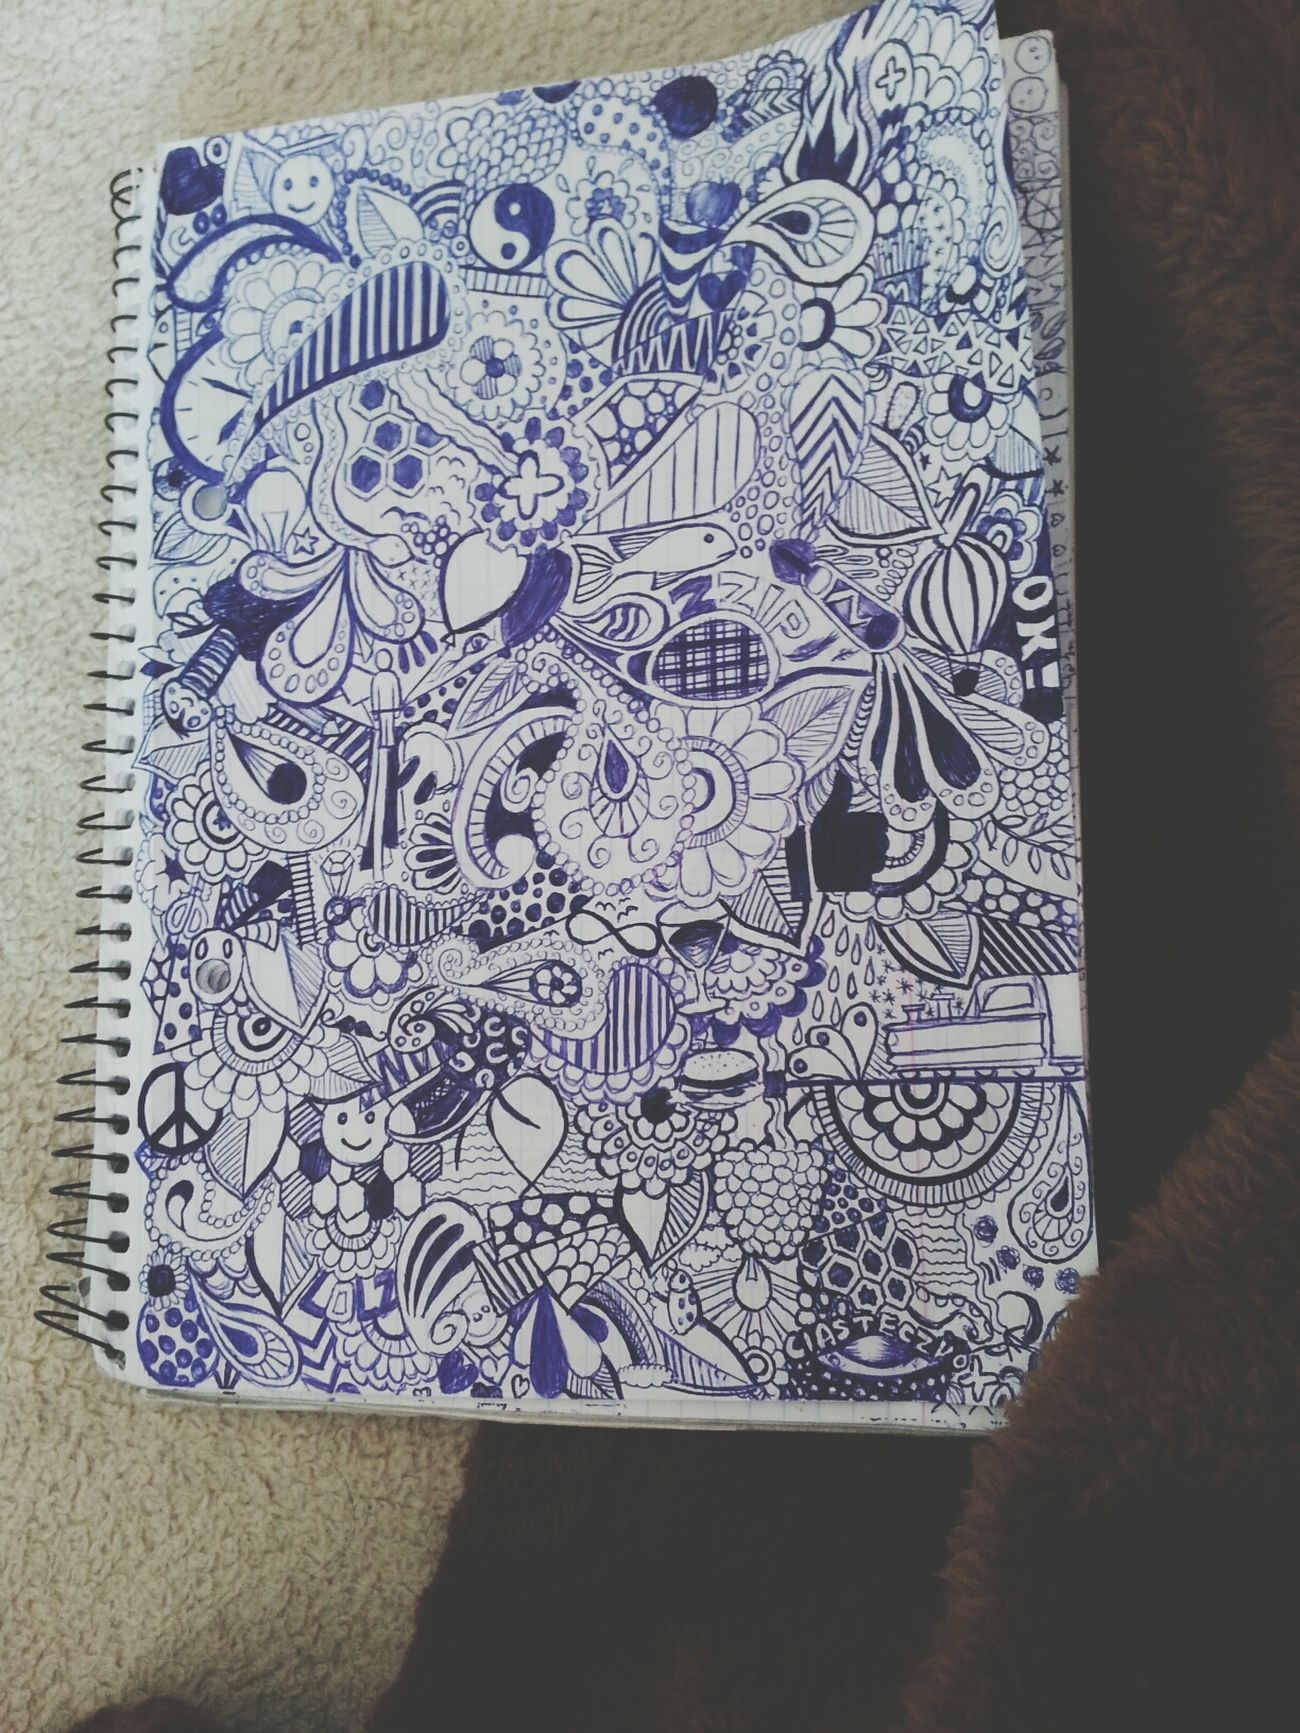 ♥♡♥ Drawing Drawings Art My Draw ♥